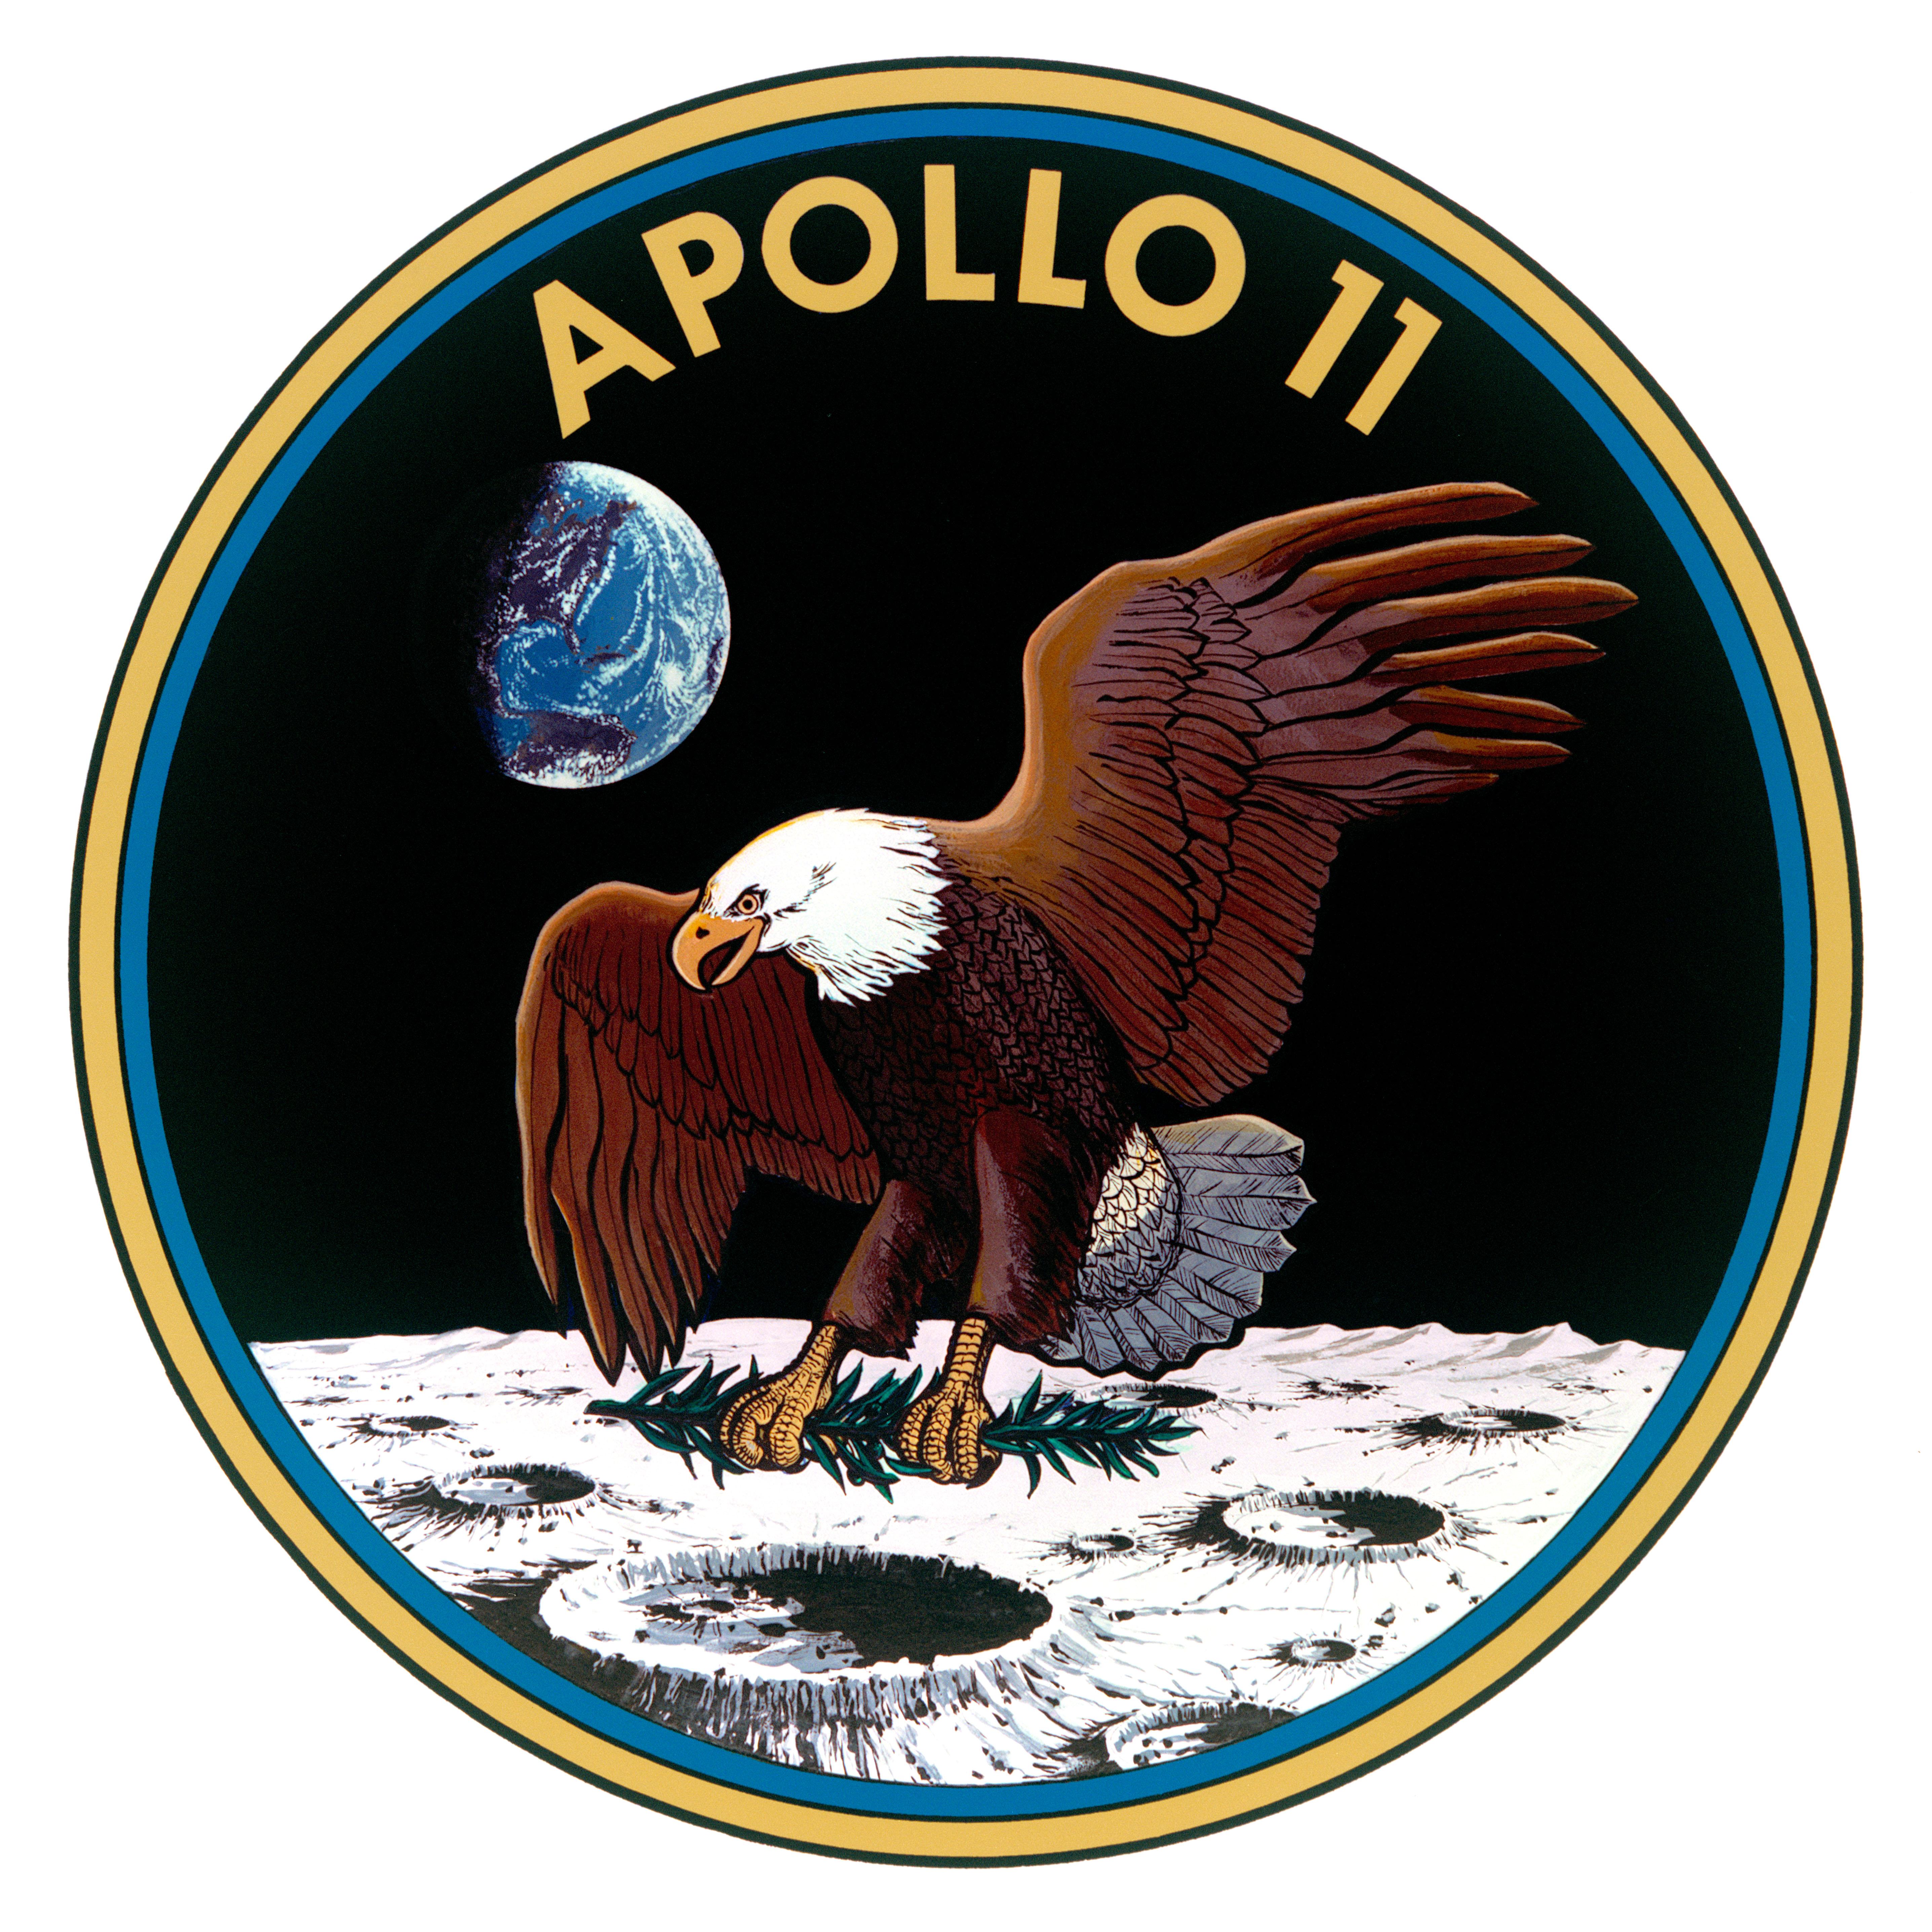 Apollo 11 Pics, Technology Collection